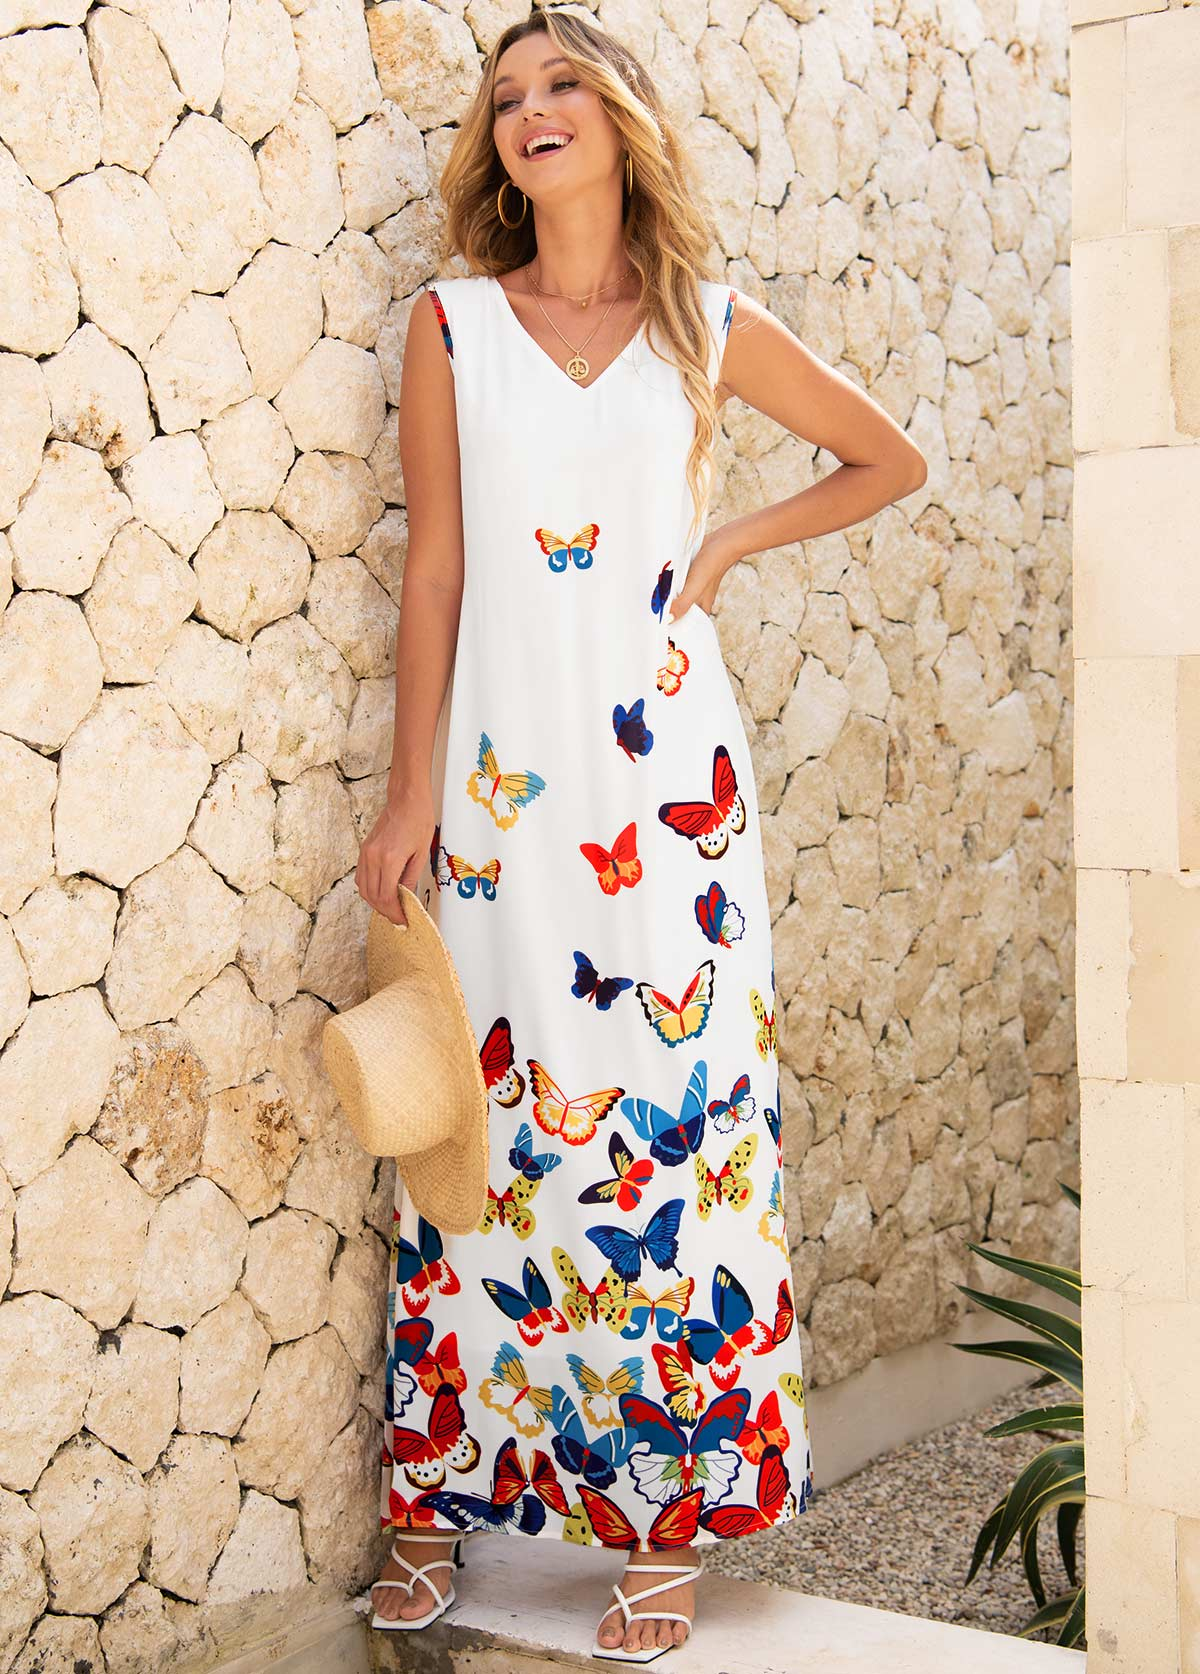 Butterfly Print Sleeveless V Neck Dress